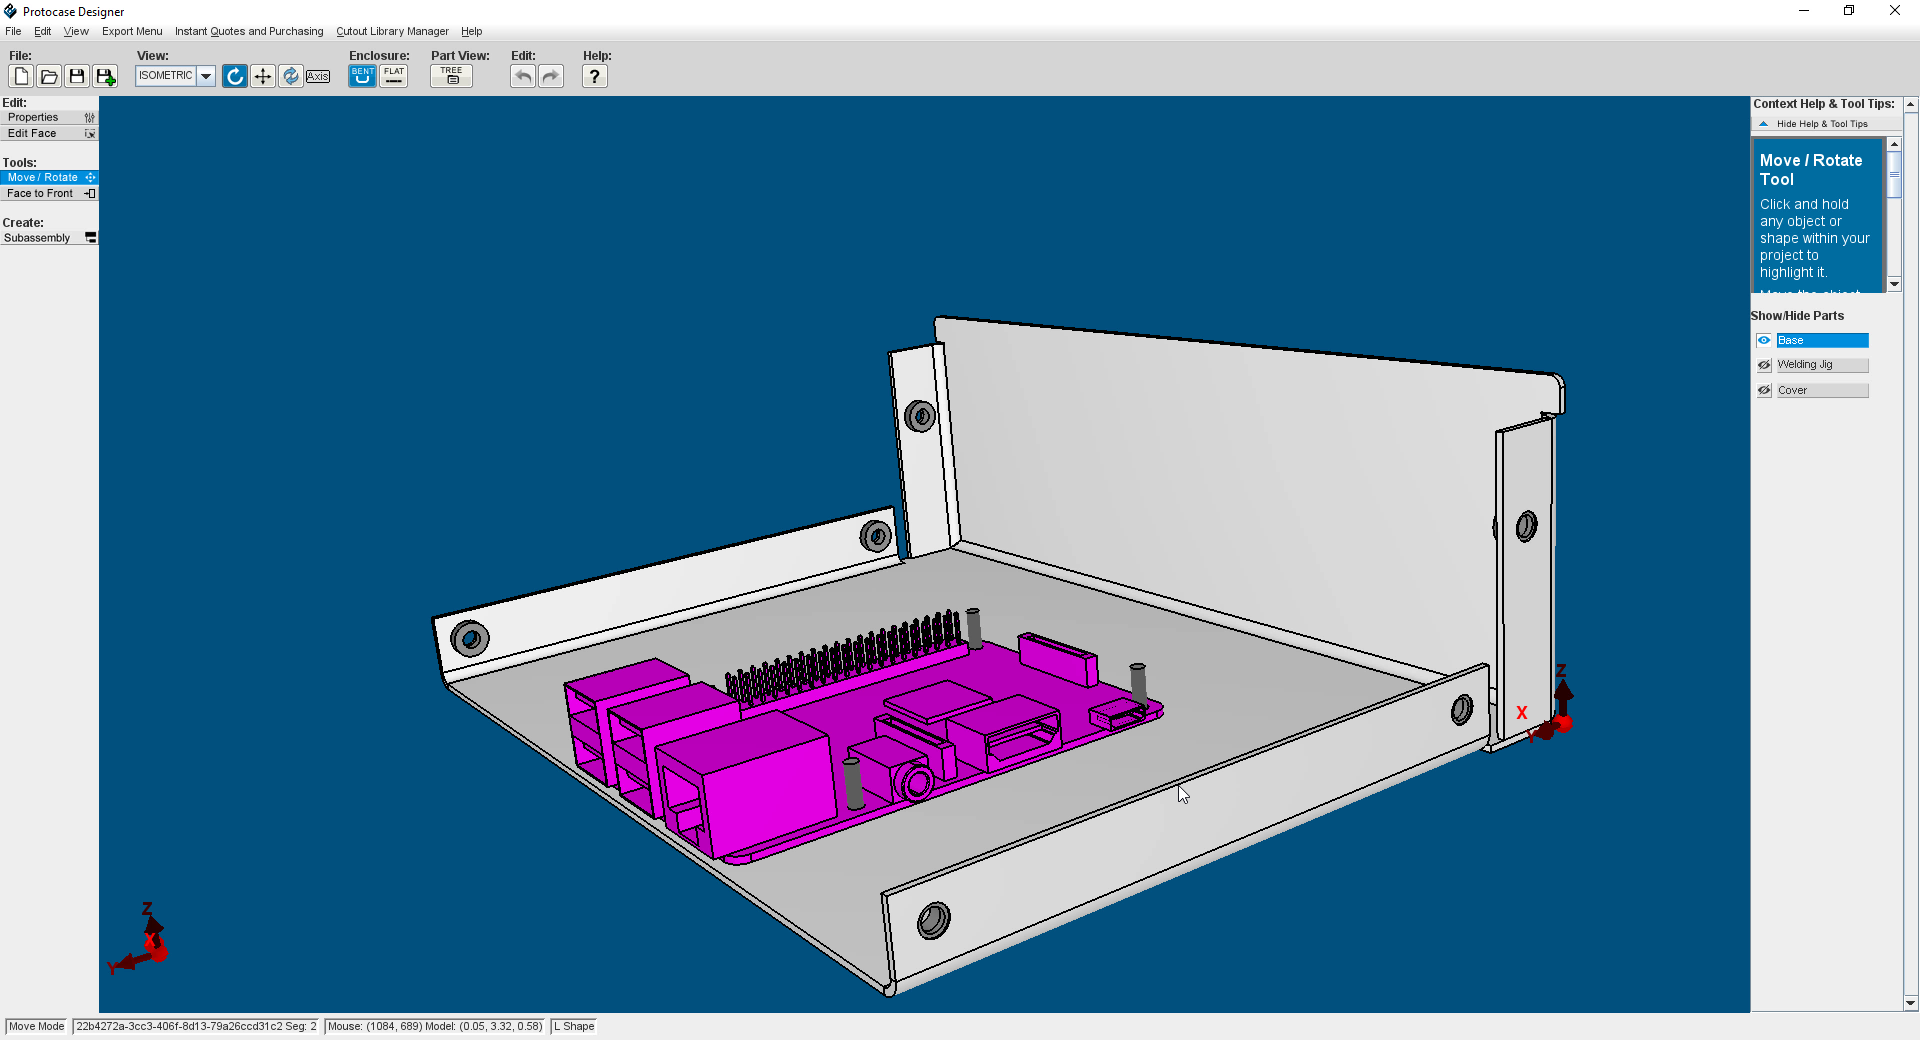 Protocase Designer 5.0